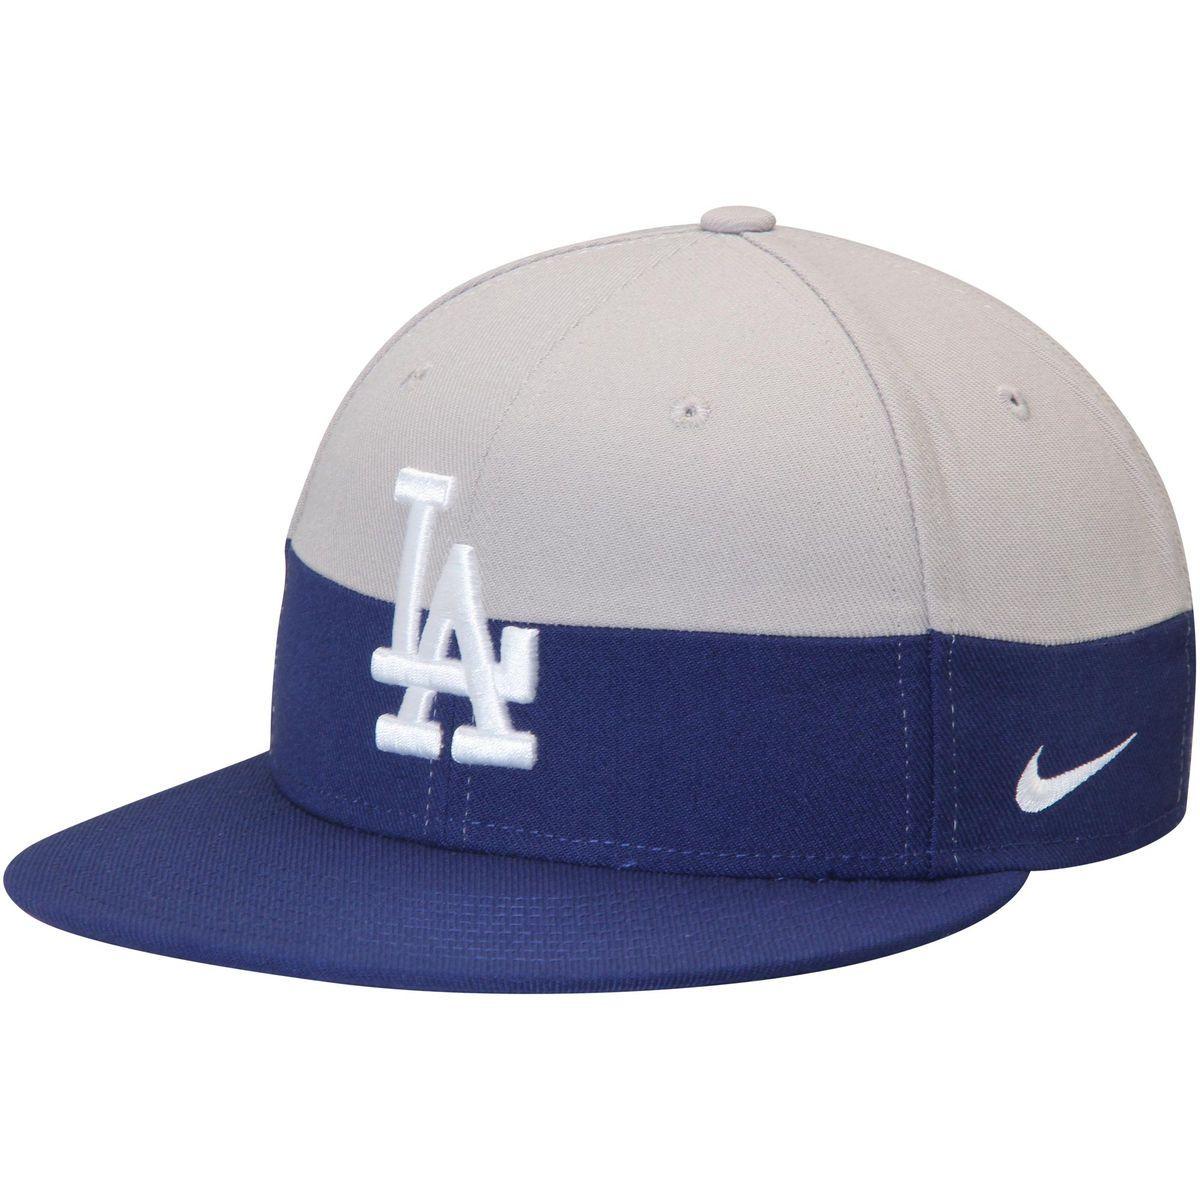 9ecd6aa2c4036 Los Angeles Dodgers Nike Color True Snapback Adjustable Hat - Gray Royal -   31.99